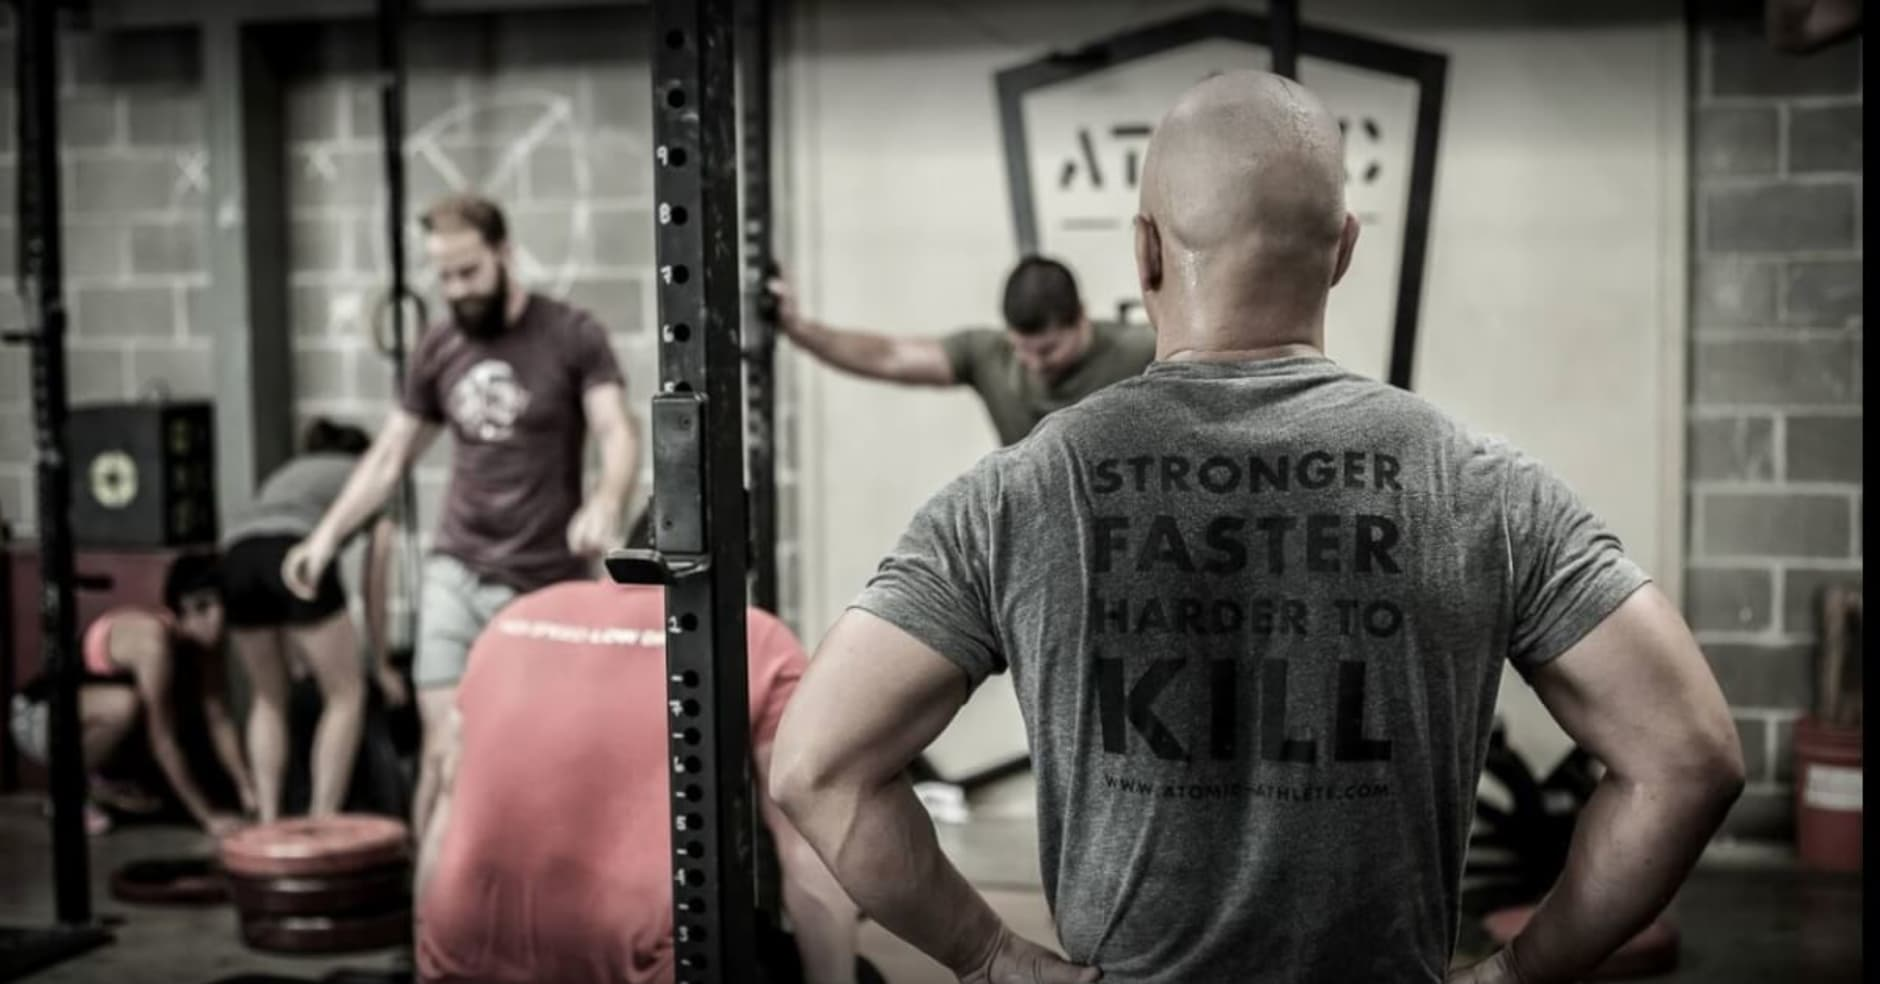 Atomic Athlete gym in Austin, Tx